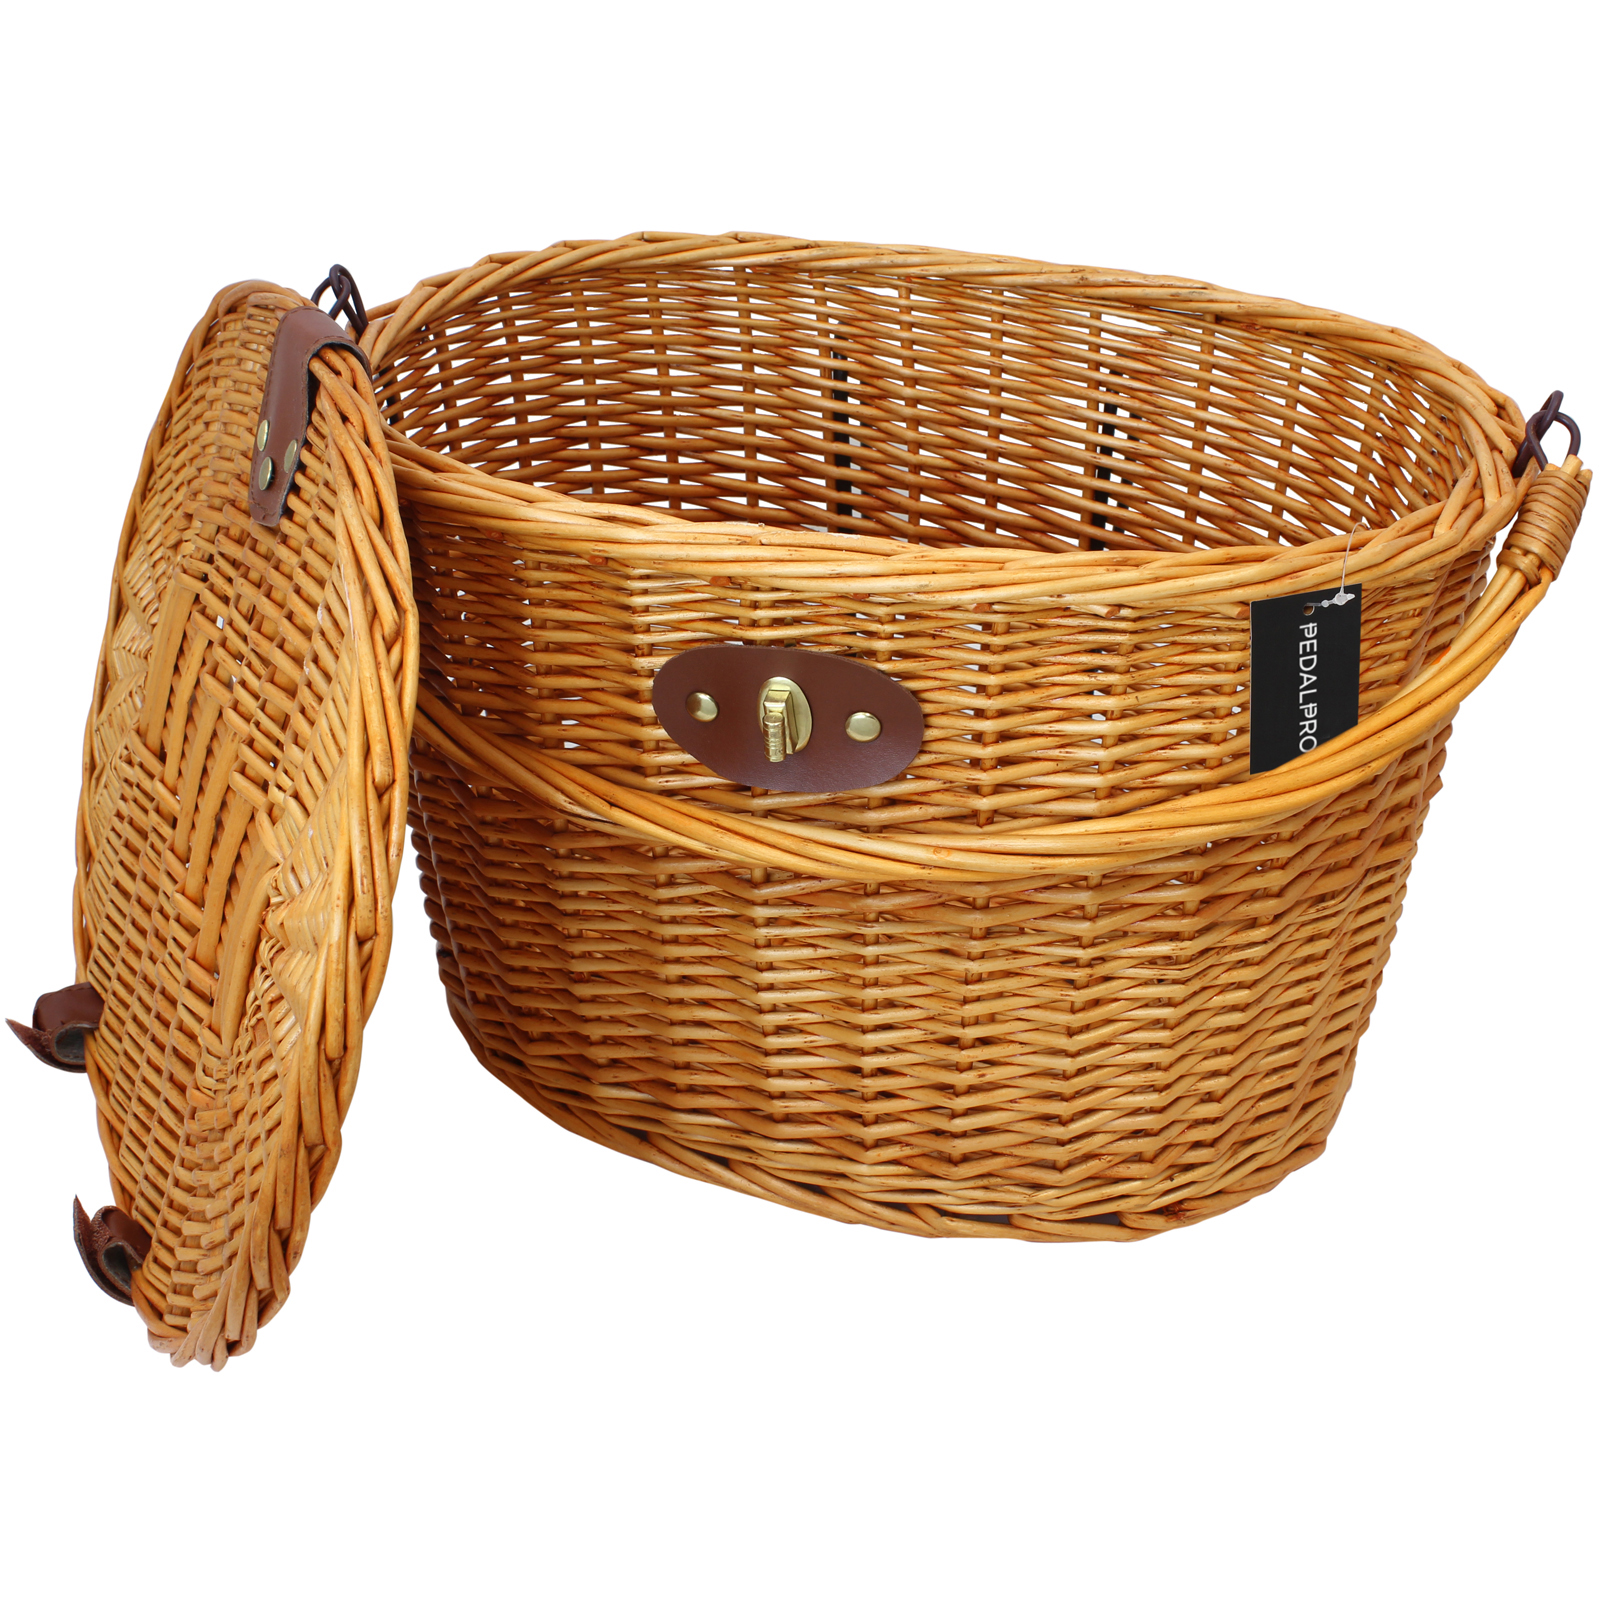 Wicker Bike Basket With Handle : Pedalpro classic wicker bicycle basket with lid handle